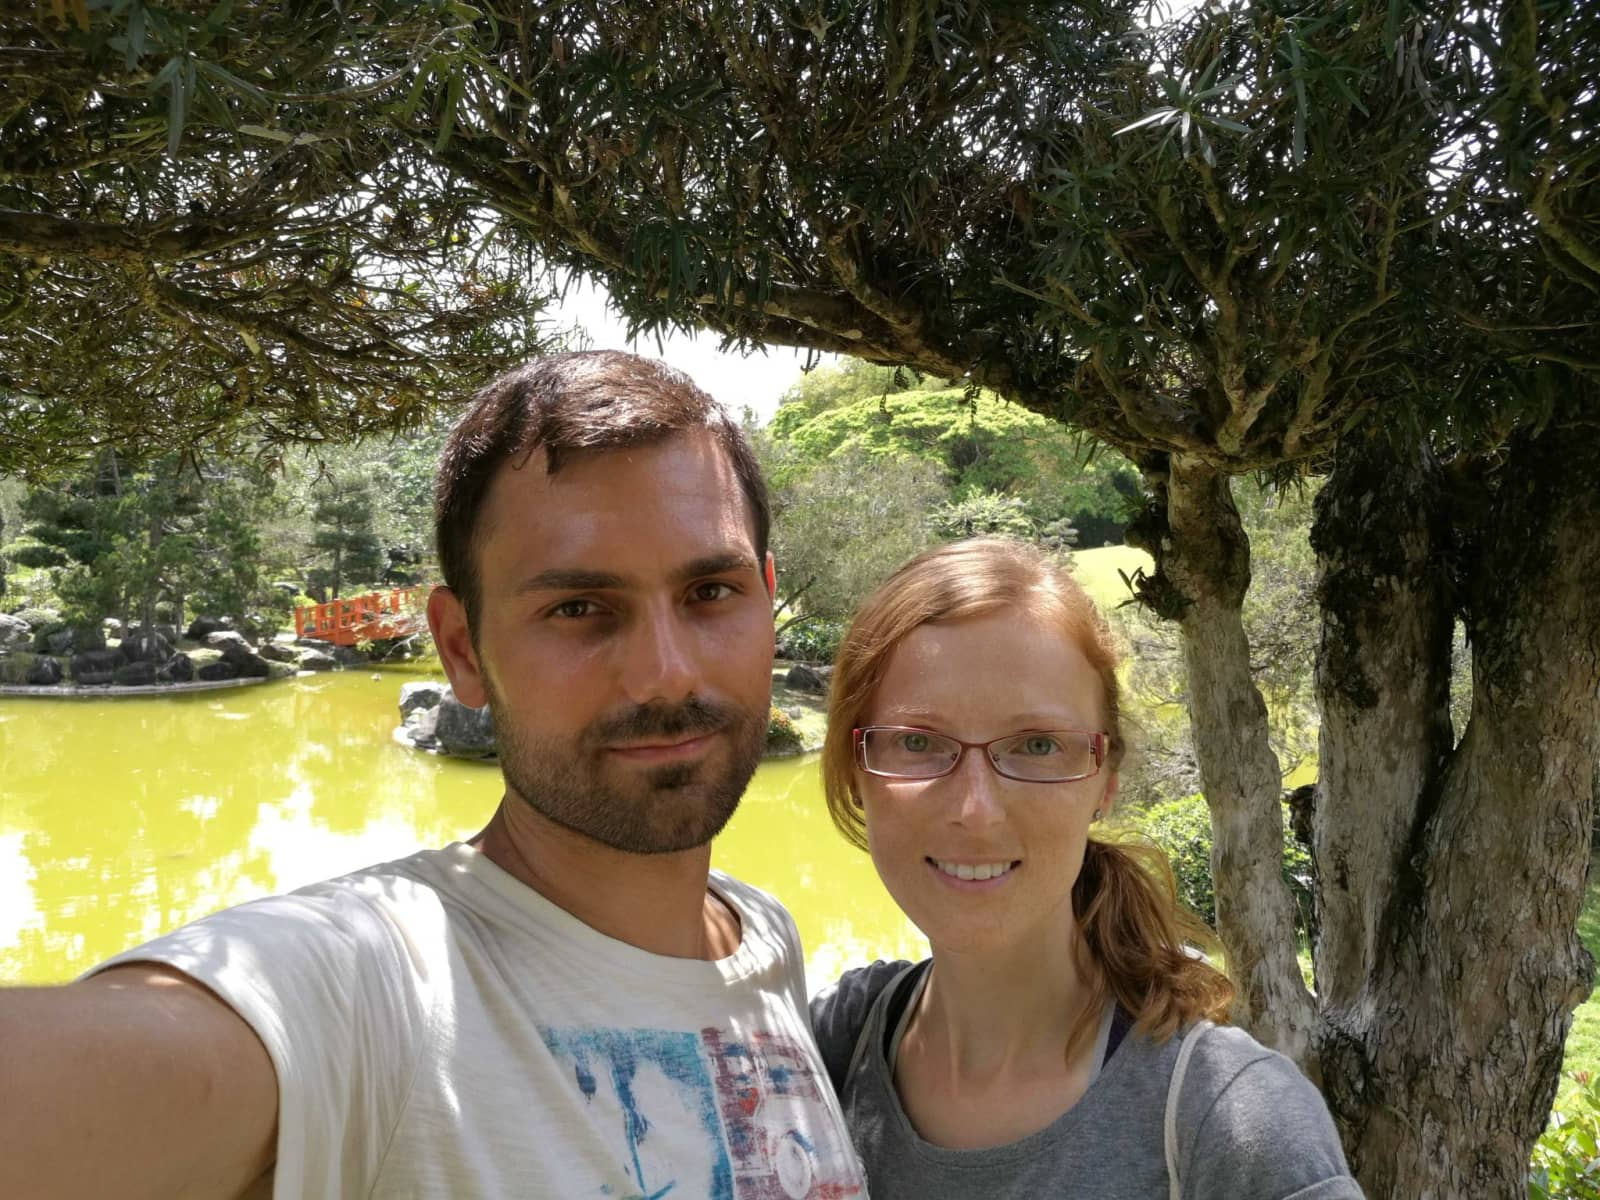 Robin & Monika from Brno, Czech Republic